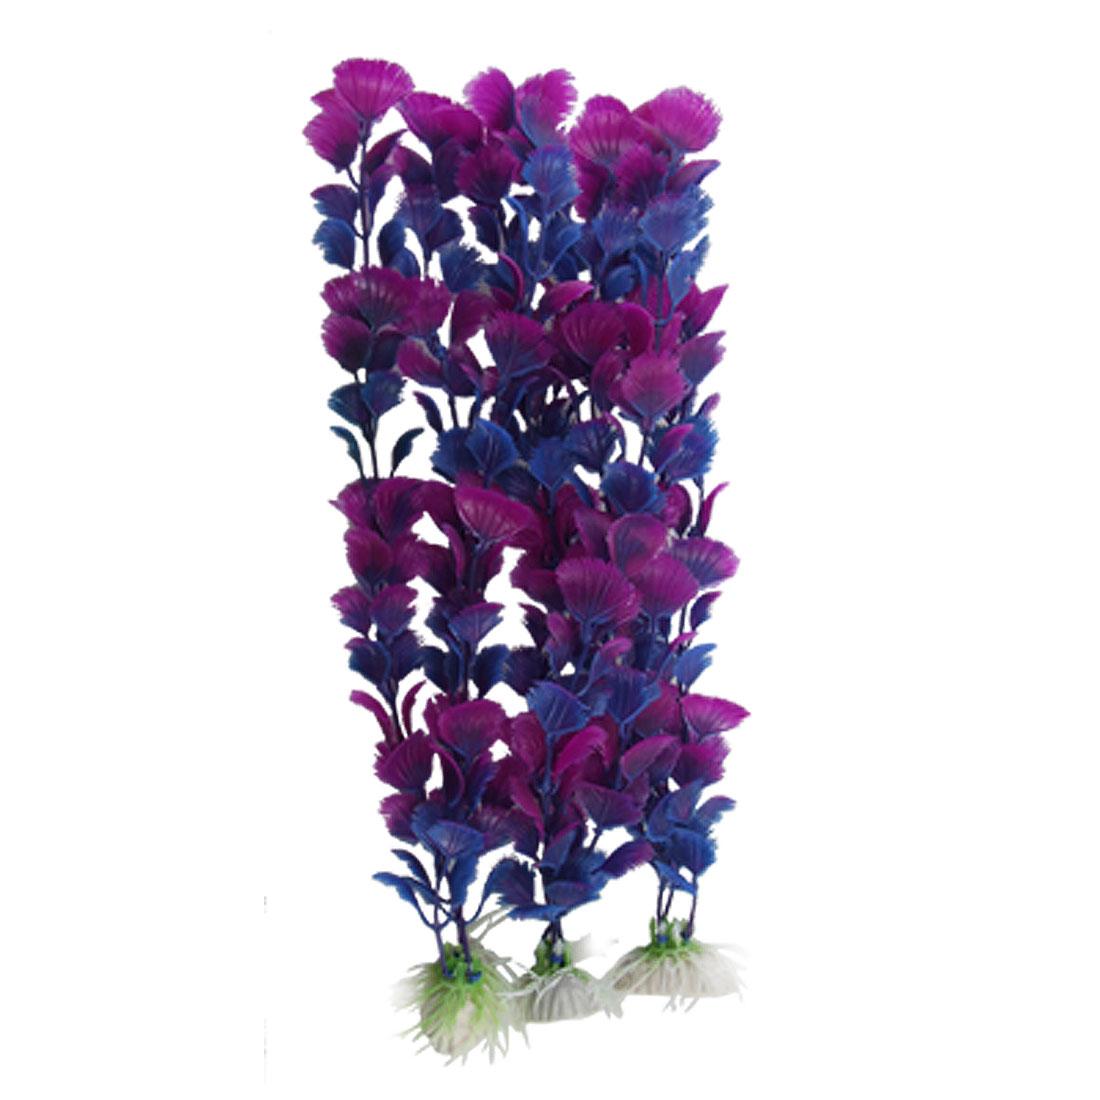 Aquarium 34cm Artificial Blue Amaranth Ginkgo Leaf Plant Decor